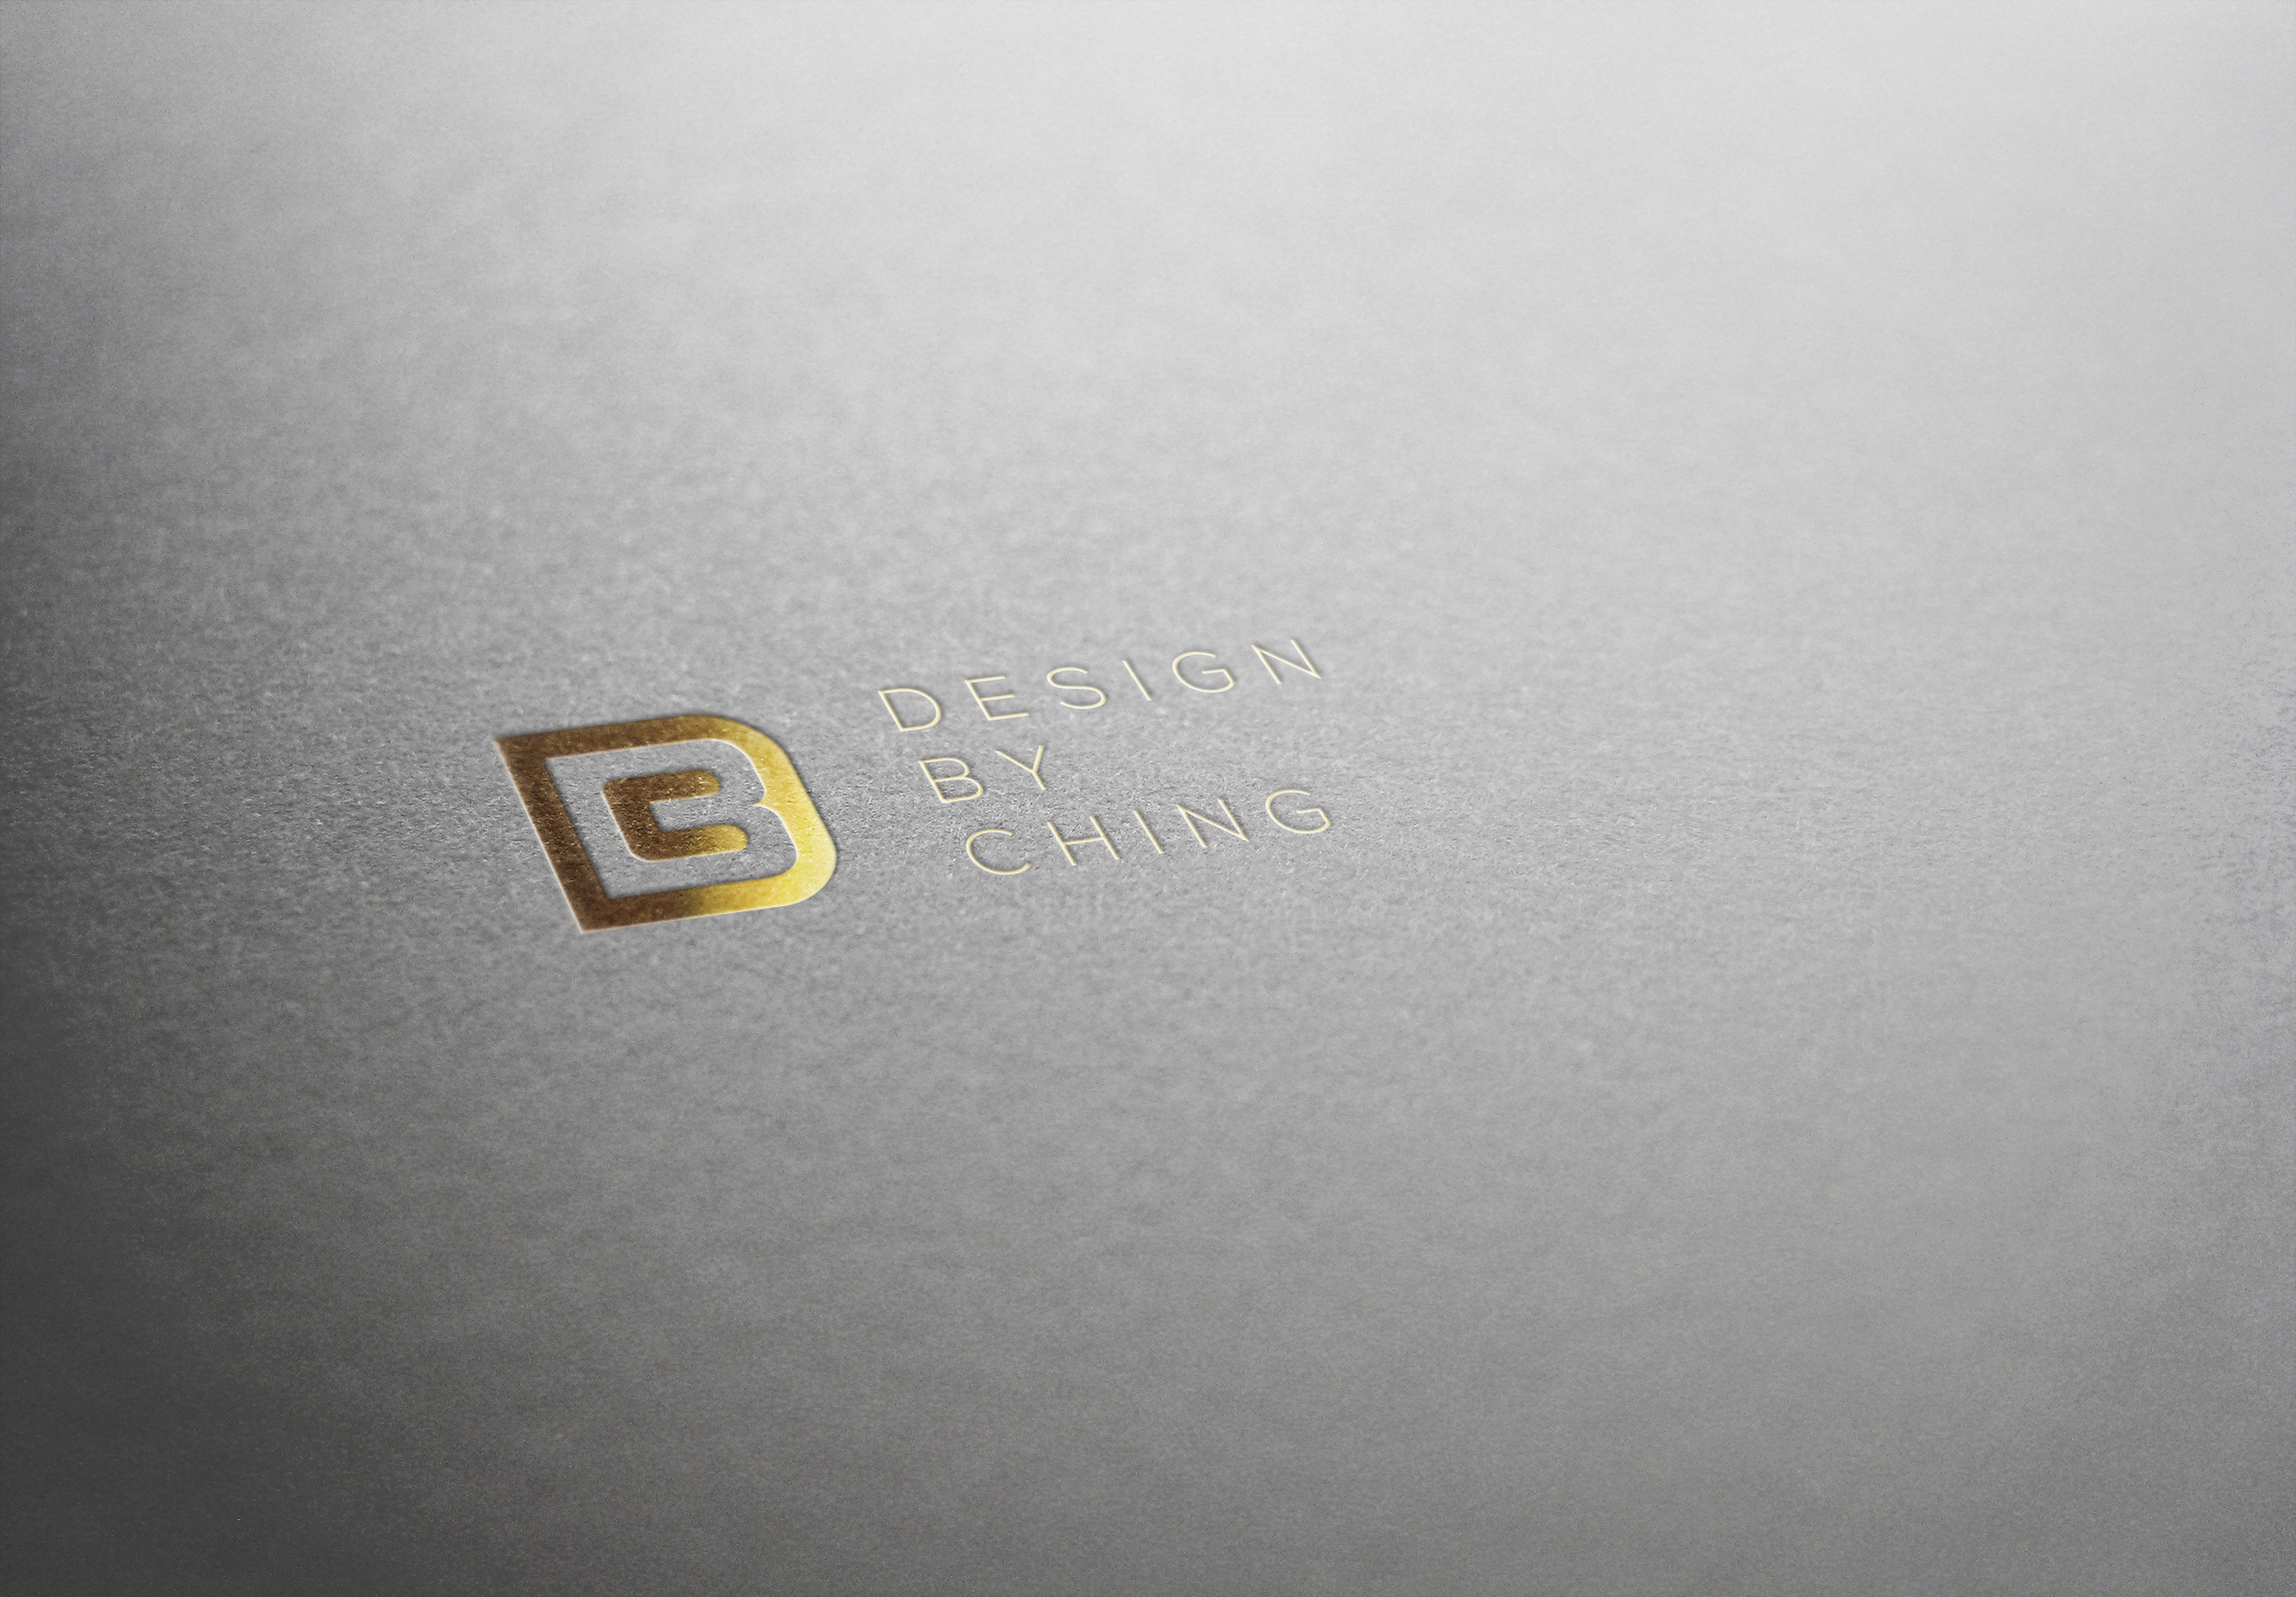 DBC_GOLD_001.jpg